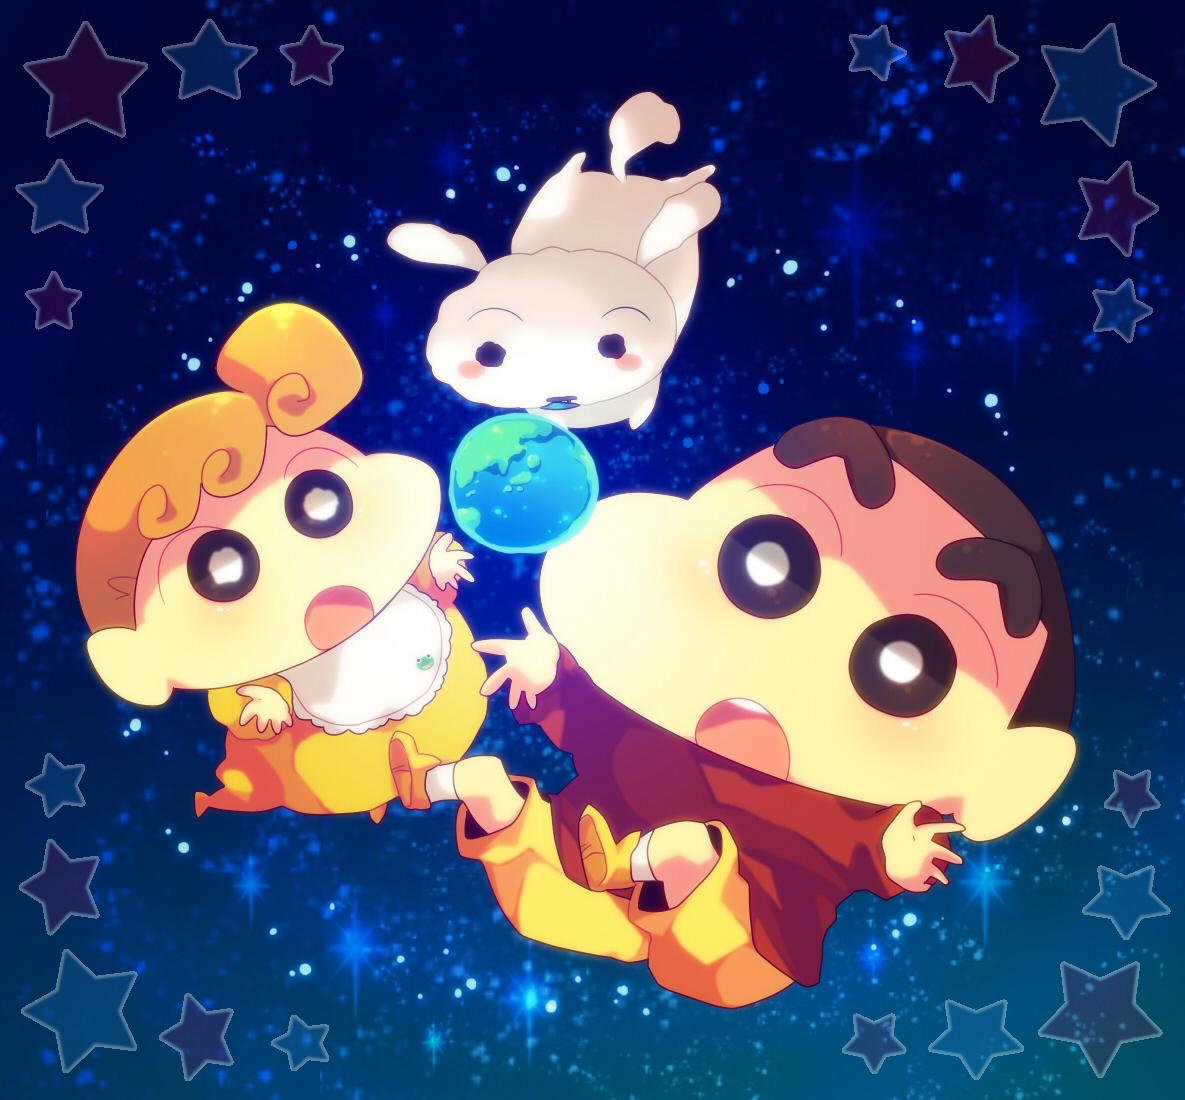 Crayon Shin-chan Image #977371 - Zerochan Anime Image Board